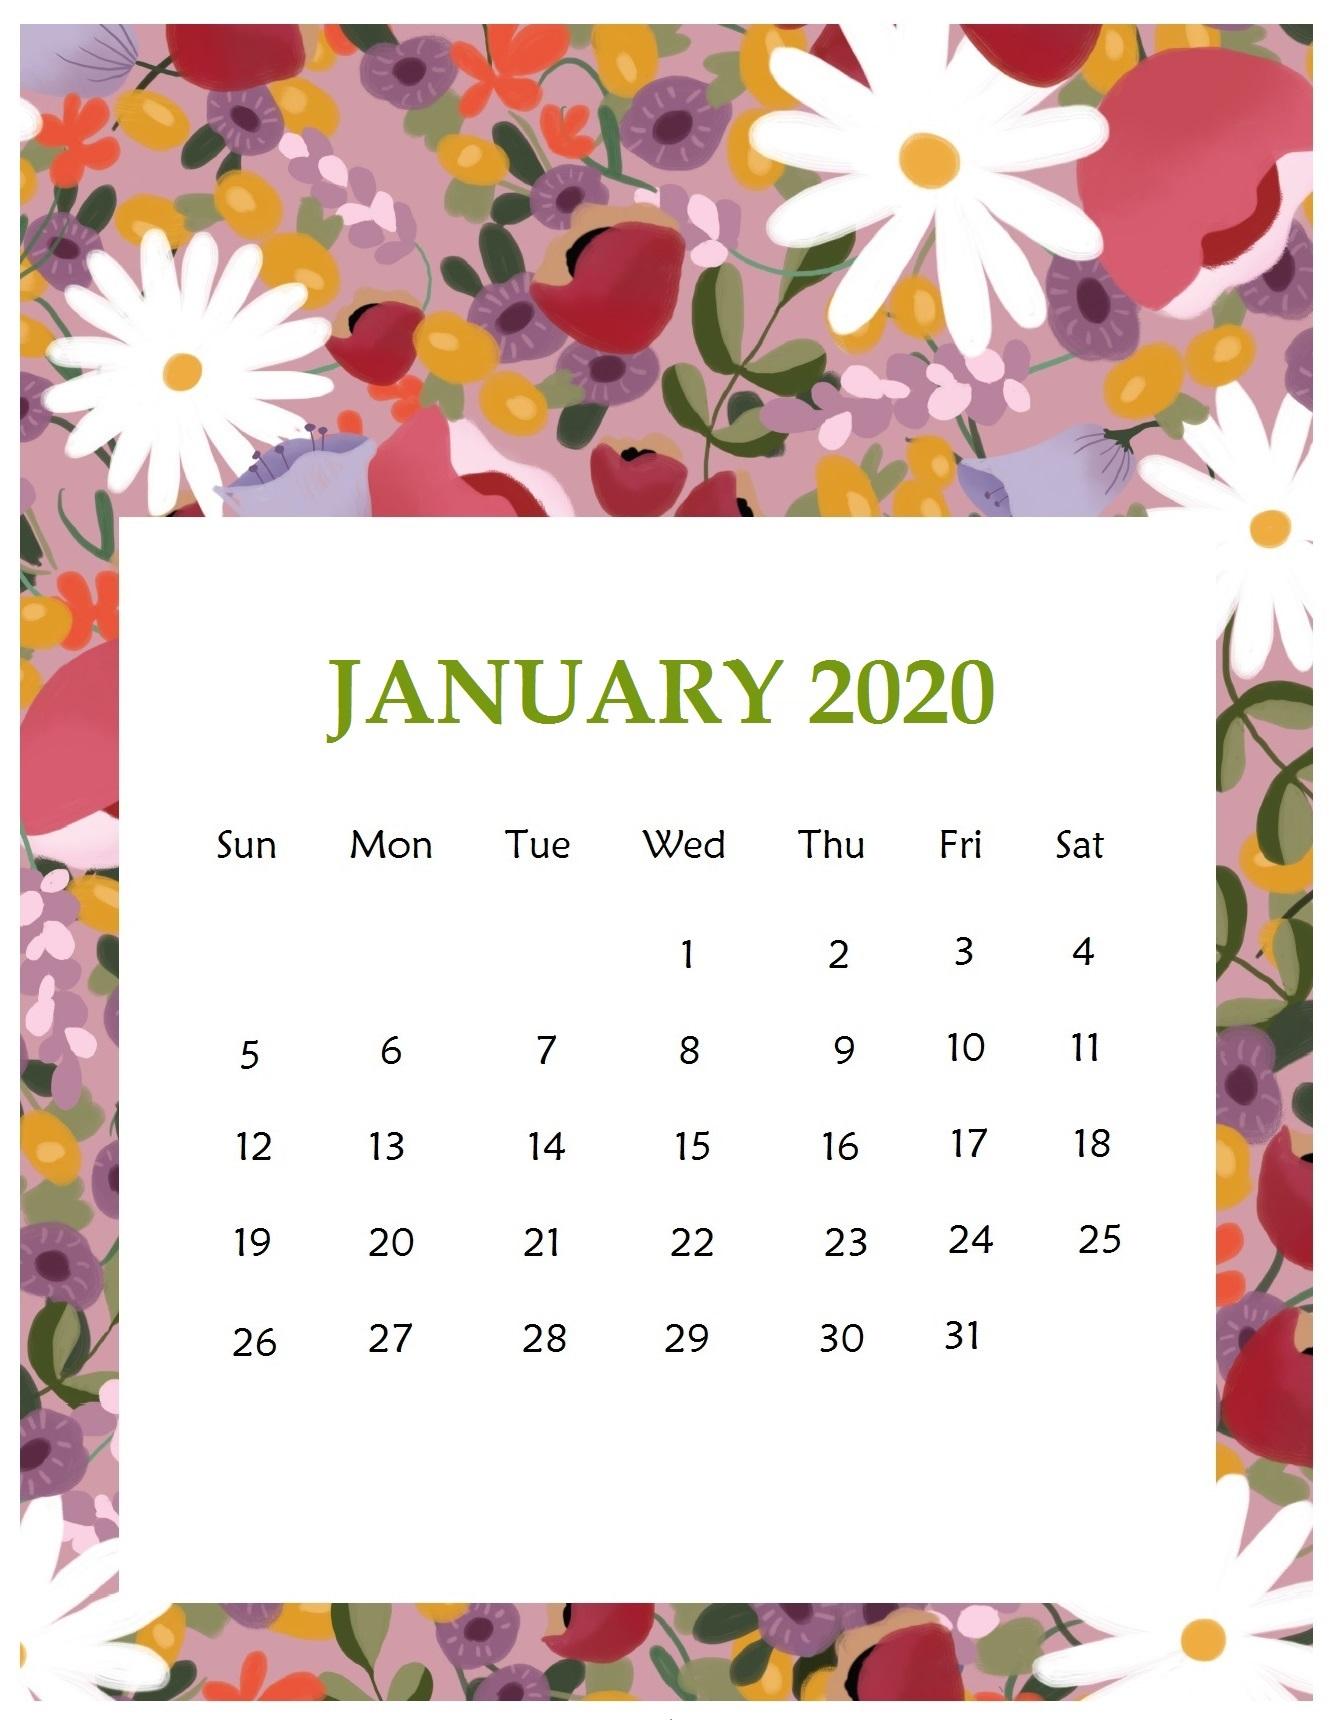 January 2020 Floral Wall Calendar